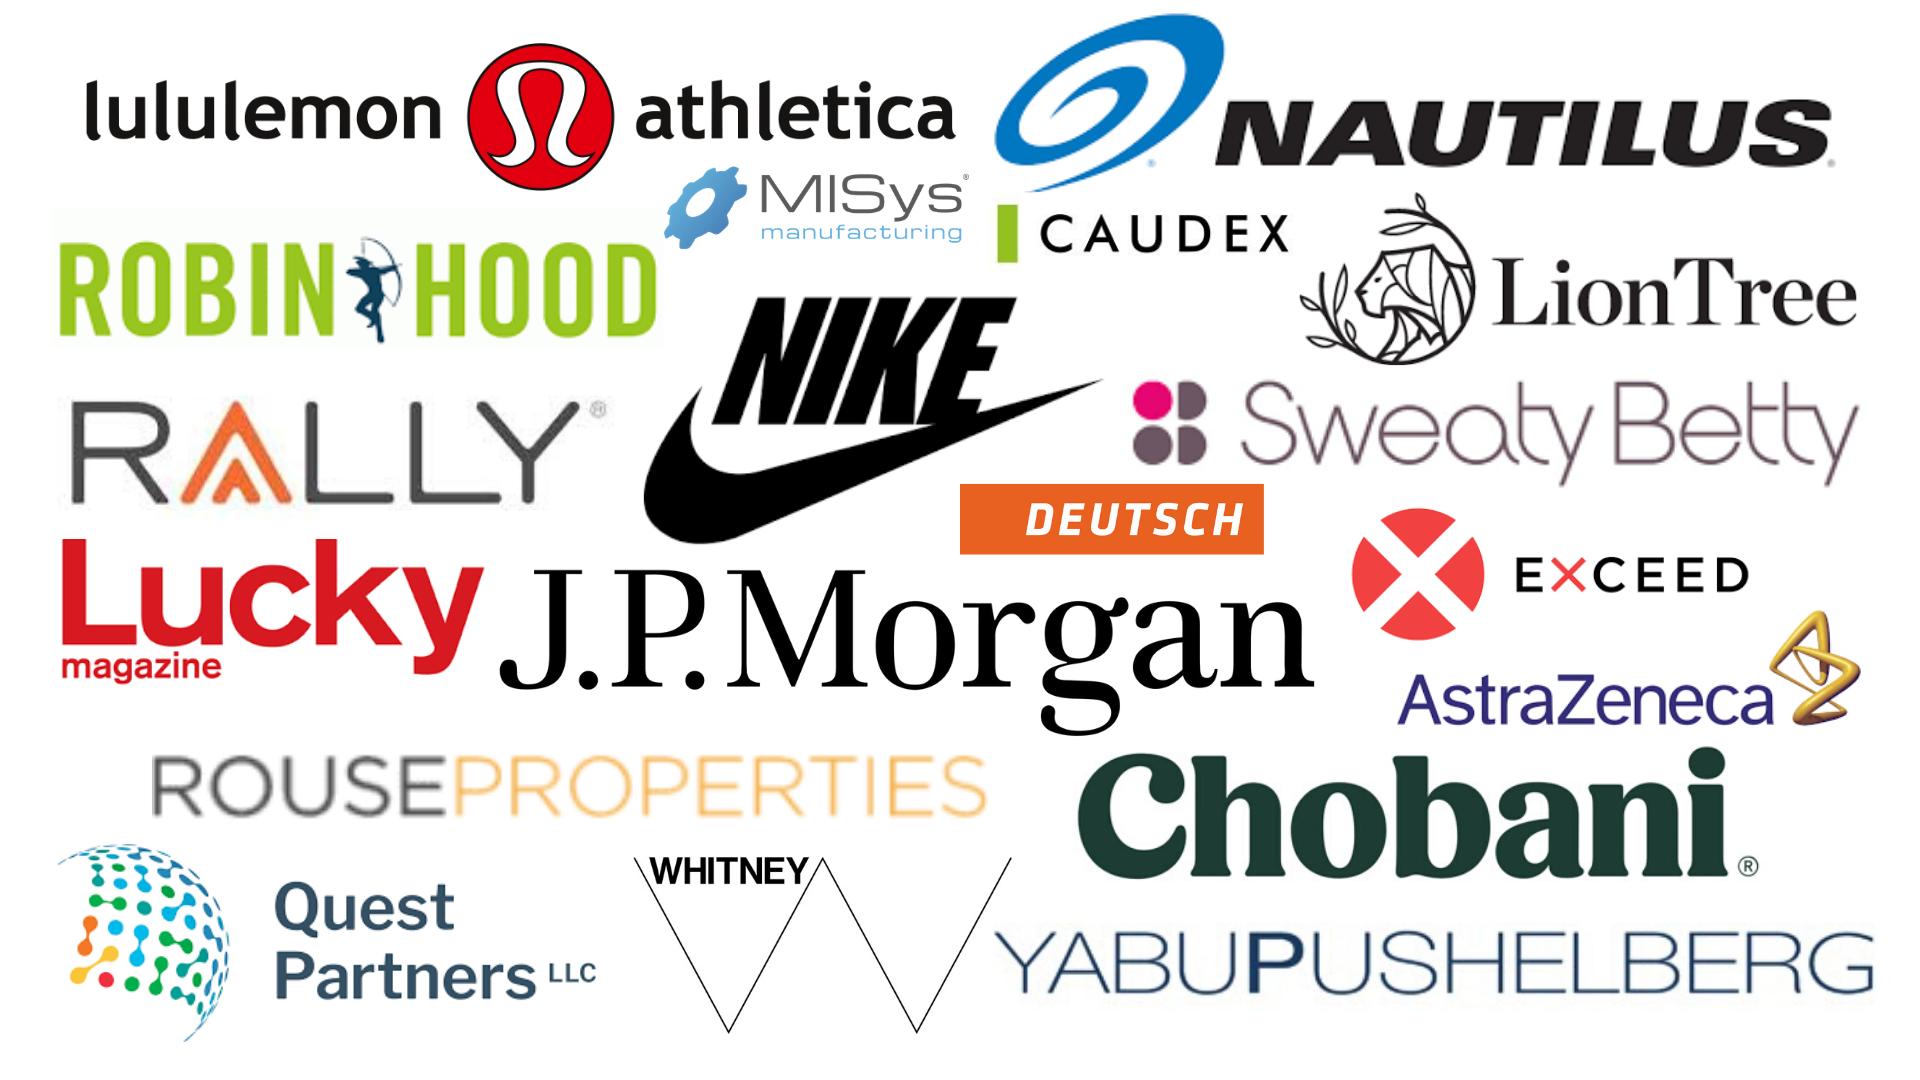 nao-wellness-logos-v2